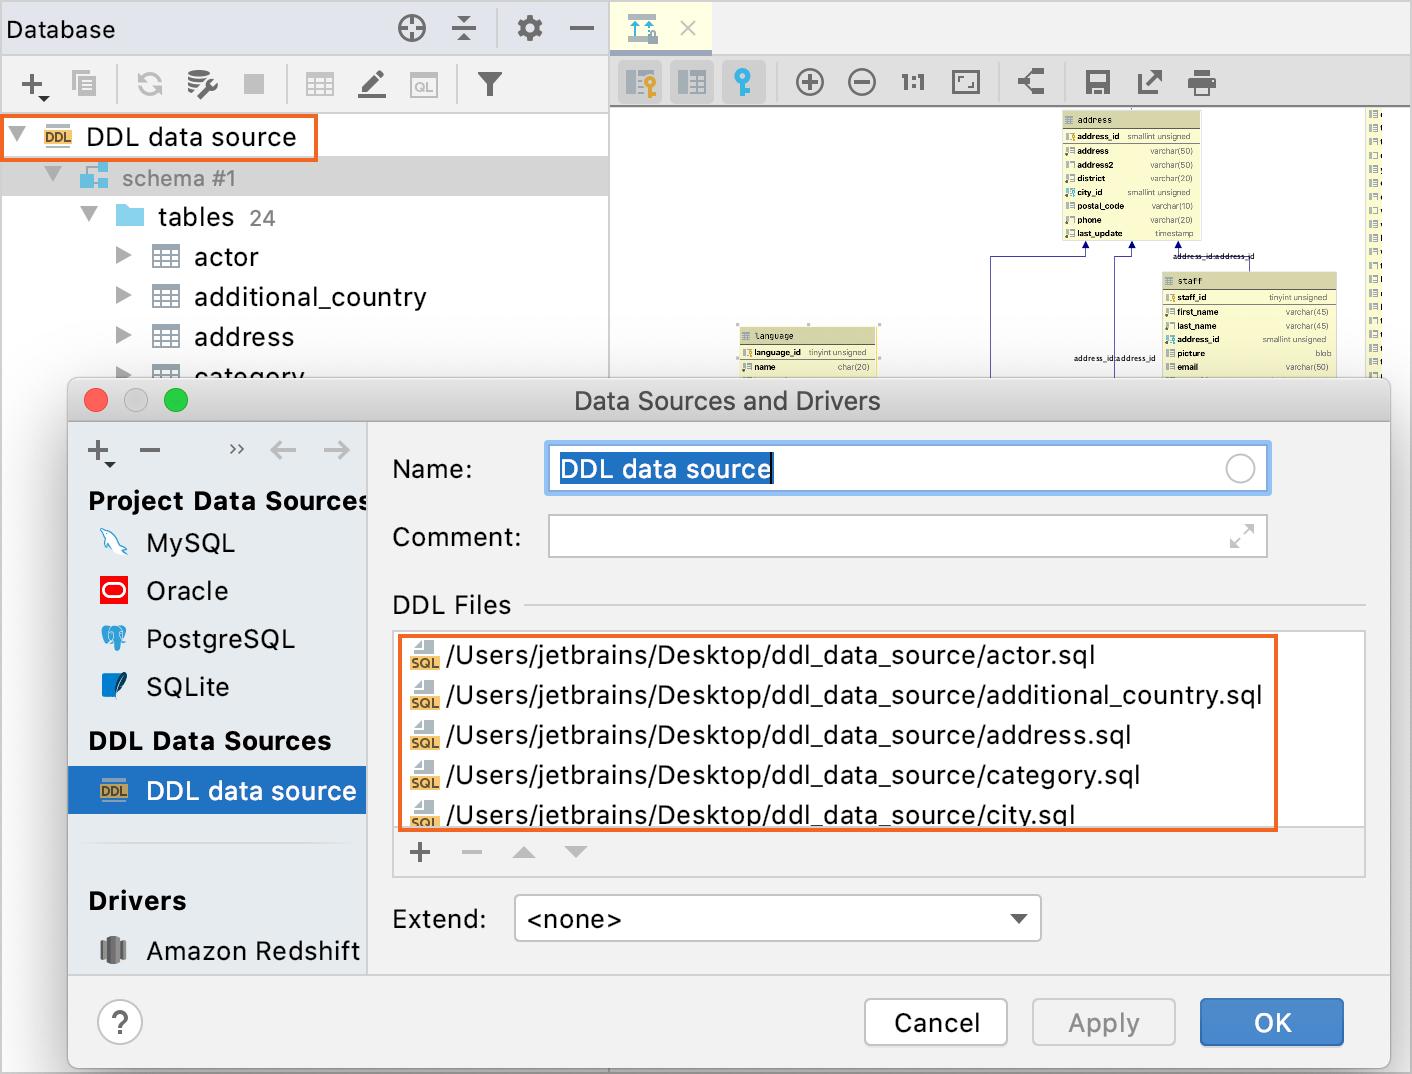 Create a DDL data source